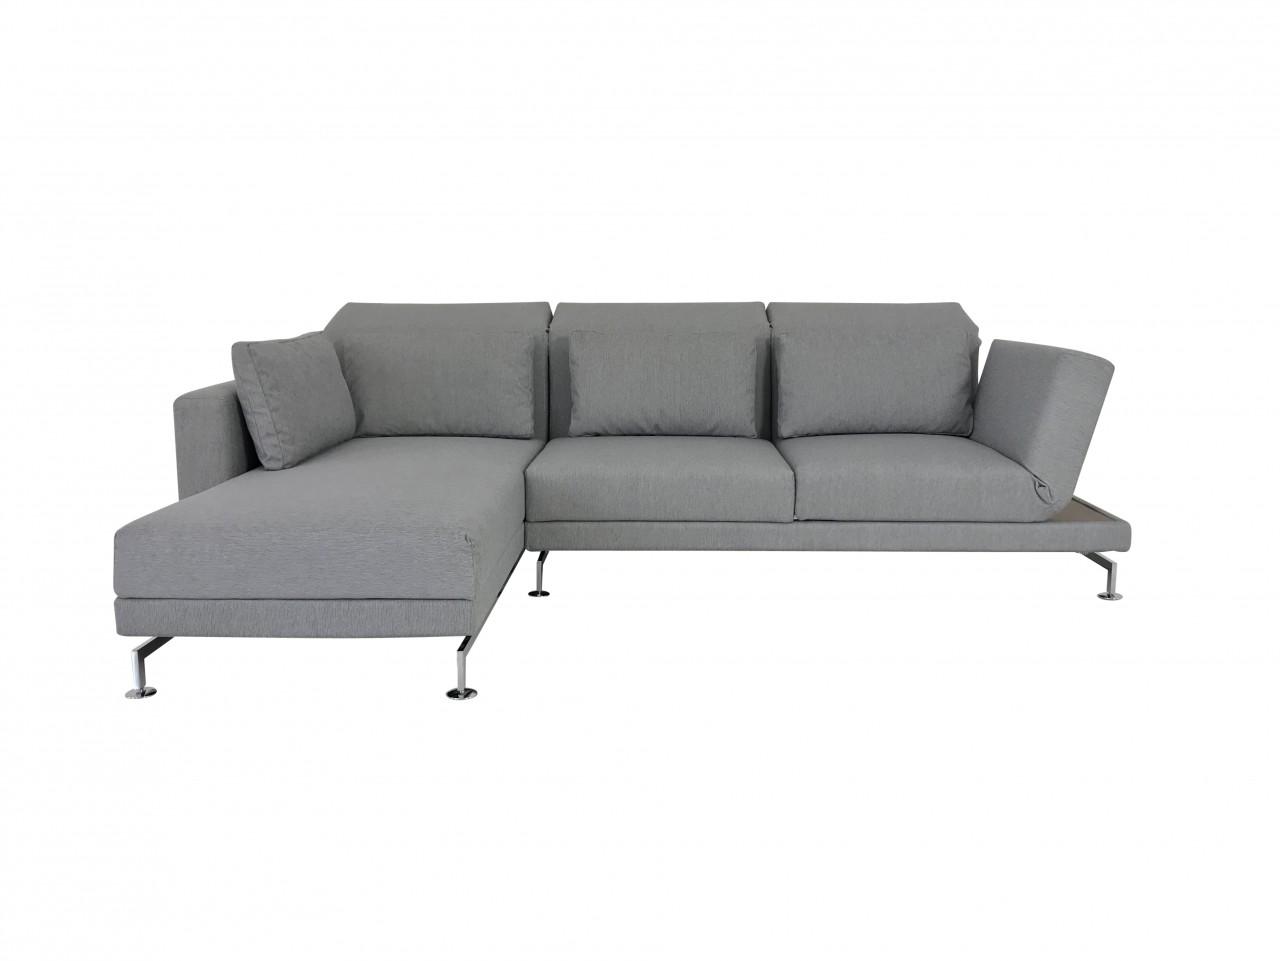 Full Size of Sofa Grau Stoff Gebraucht Kaufen Reinigen Couch Grober Meliert Ikea Big Brhl Moule Medium Mit Recamiere Im Grauen Ablage Bunt U Form Xxl 3 Sitzer Samt Weiß Sofa Sofa Grau Stoff